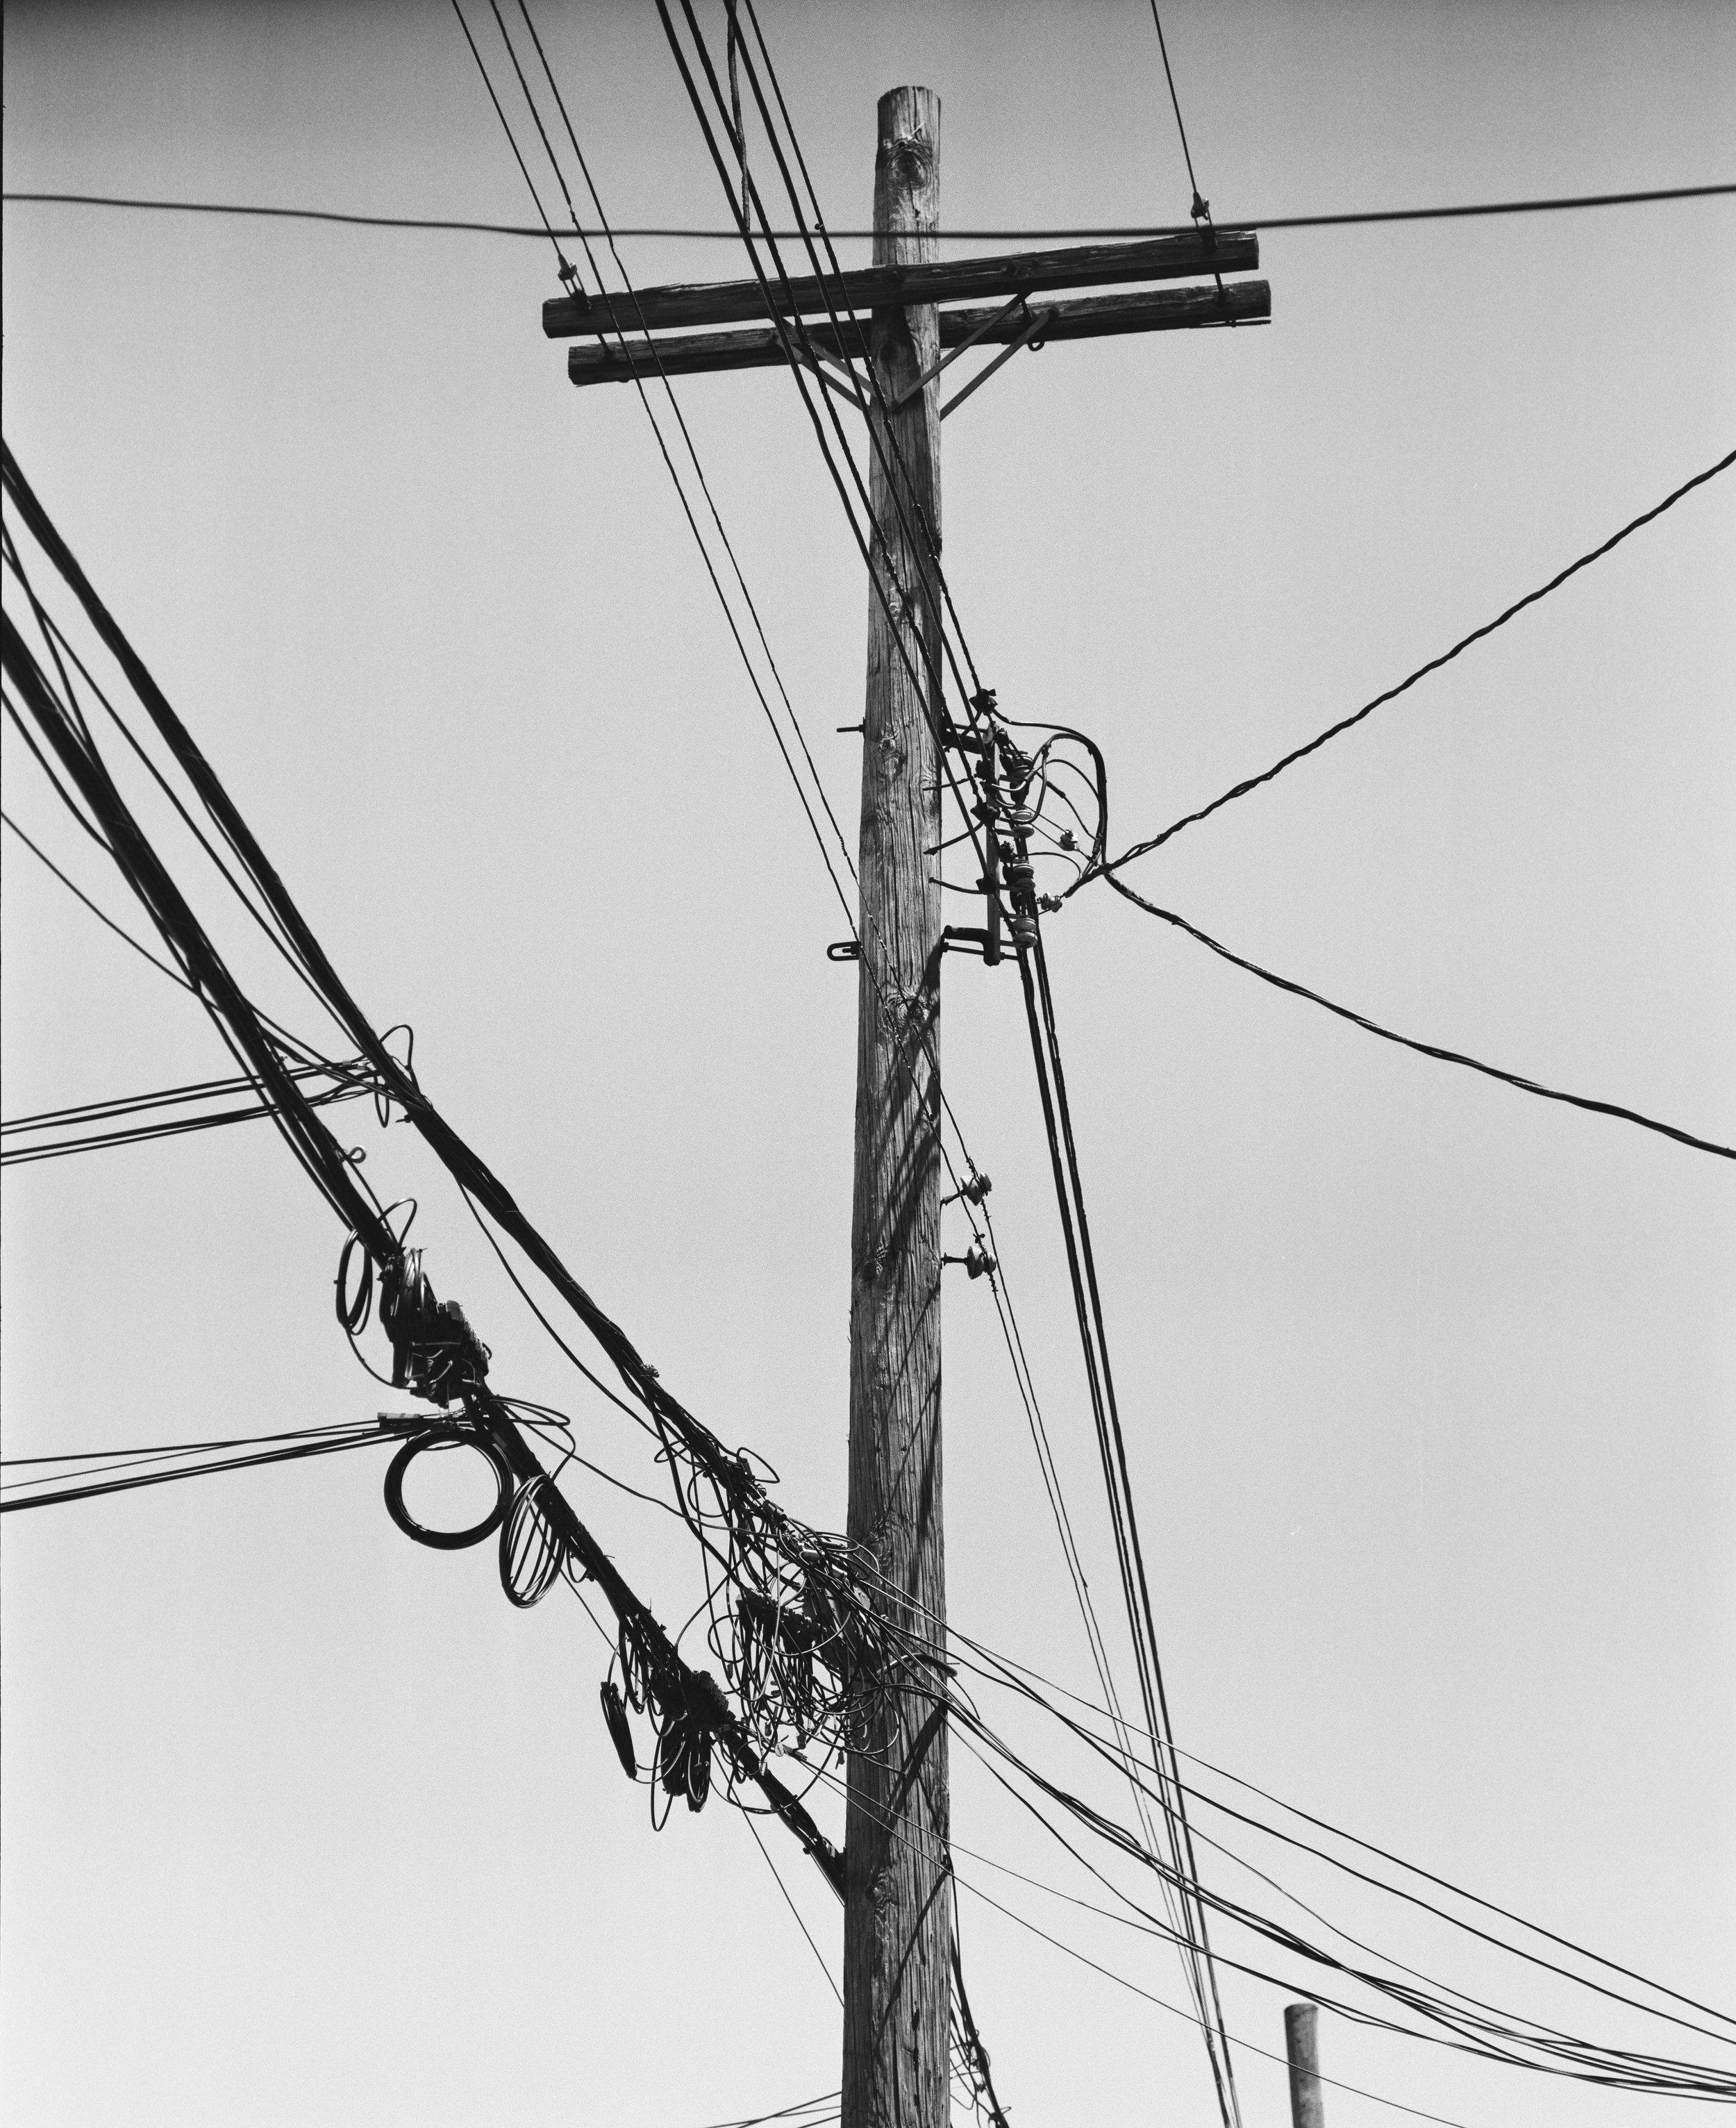 Film1177_45.JPG